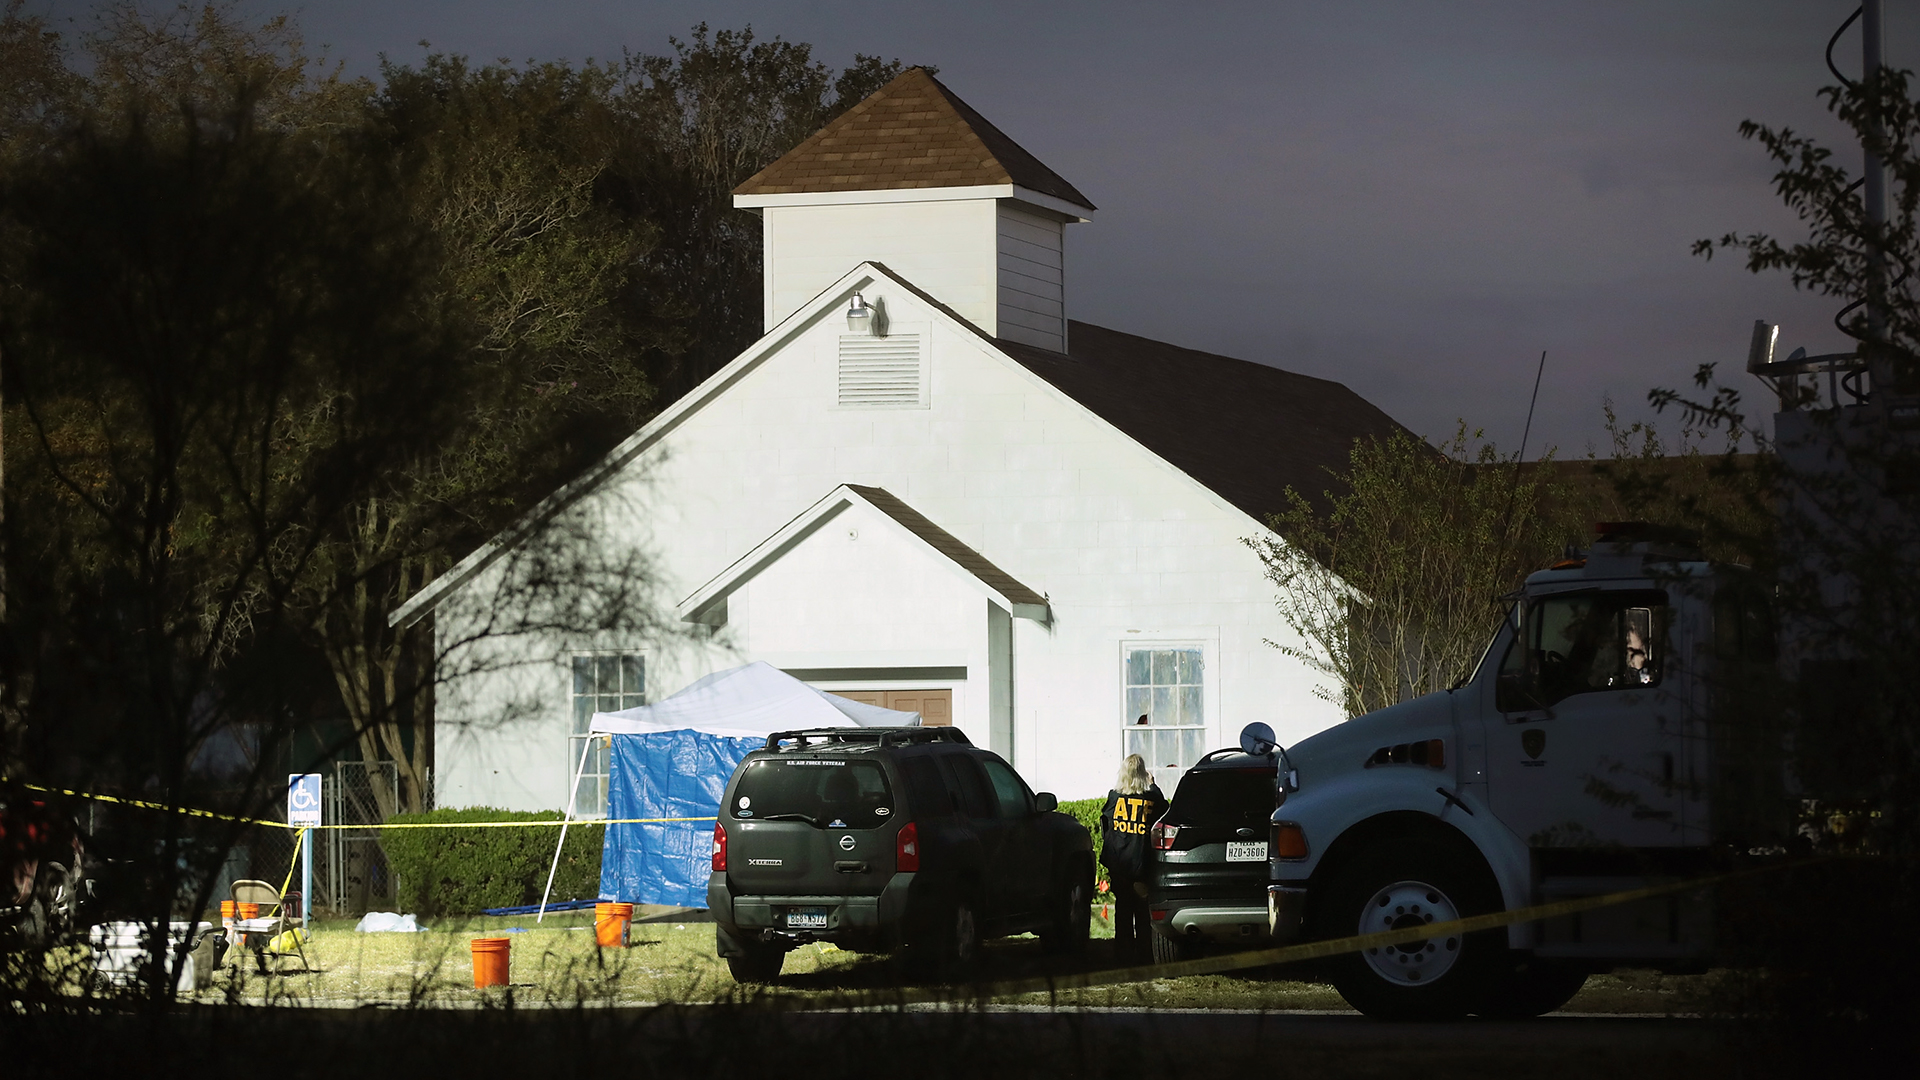 Texas Church Shooting First Baptist Church crime scene-159532.jpg87328718